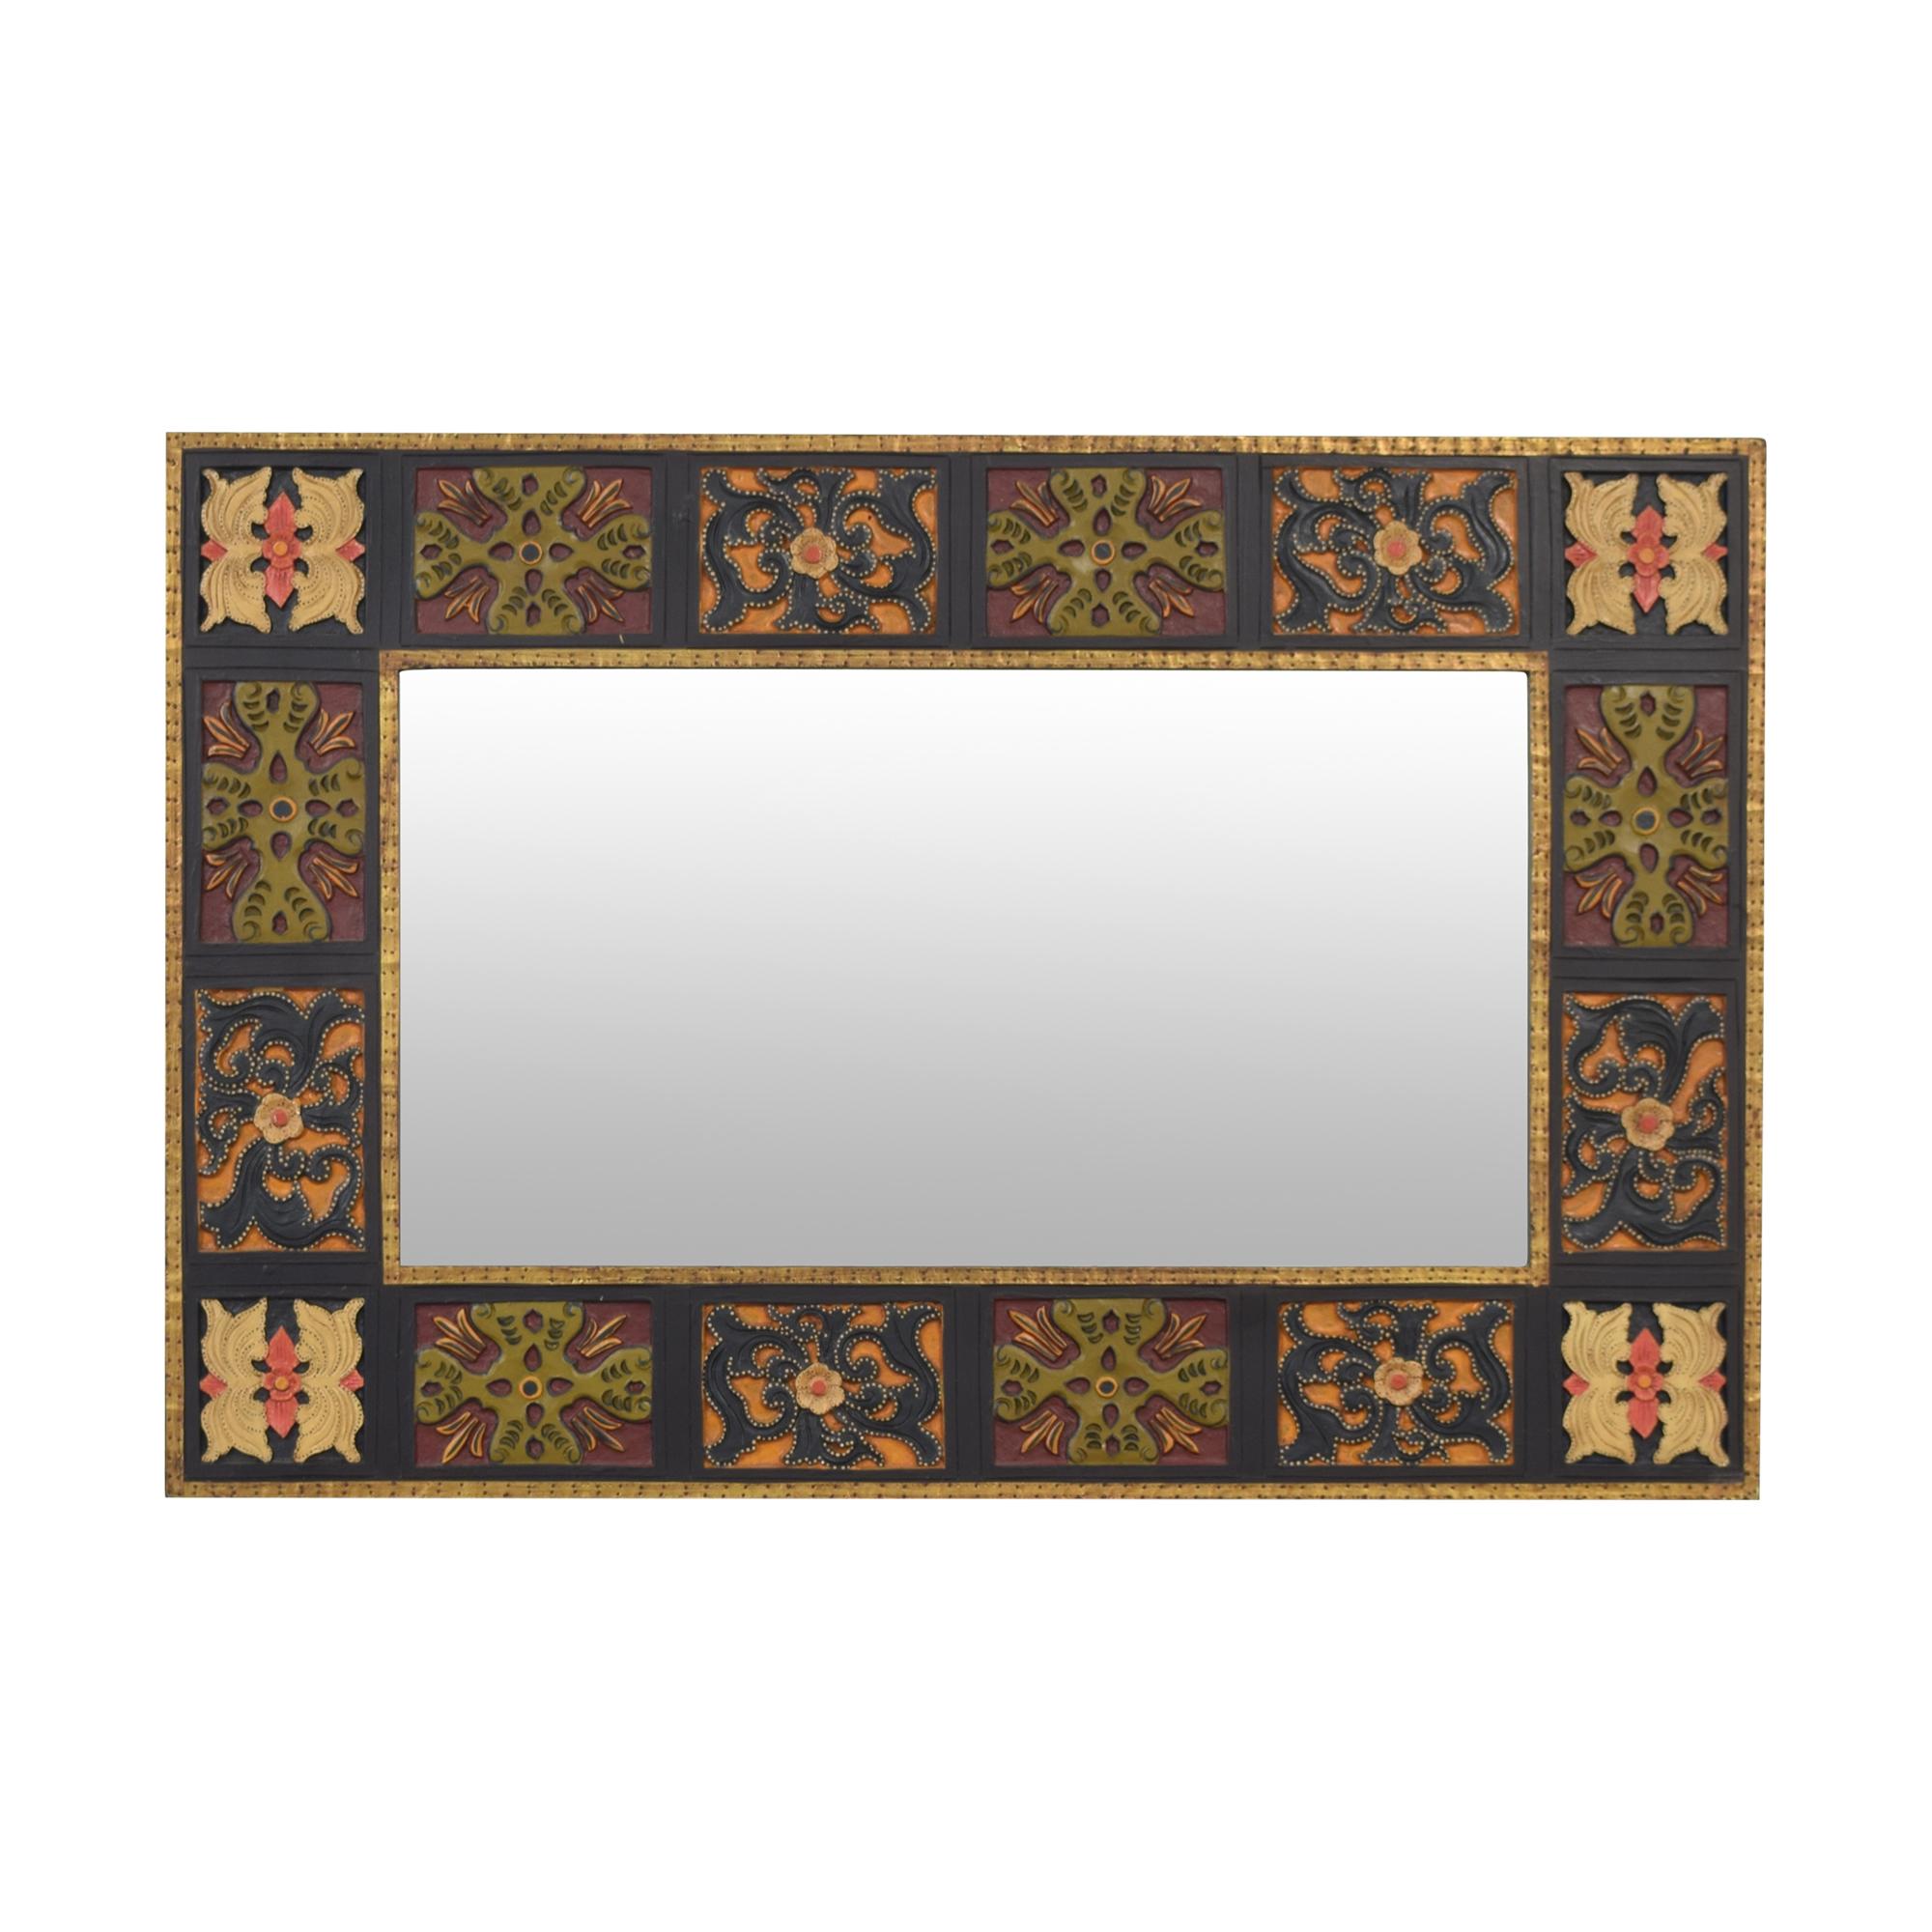 Pier 1 Pier 1 Block Framed Wall Mirror coupon